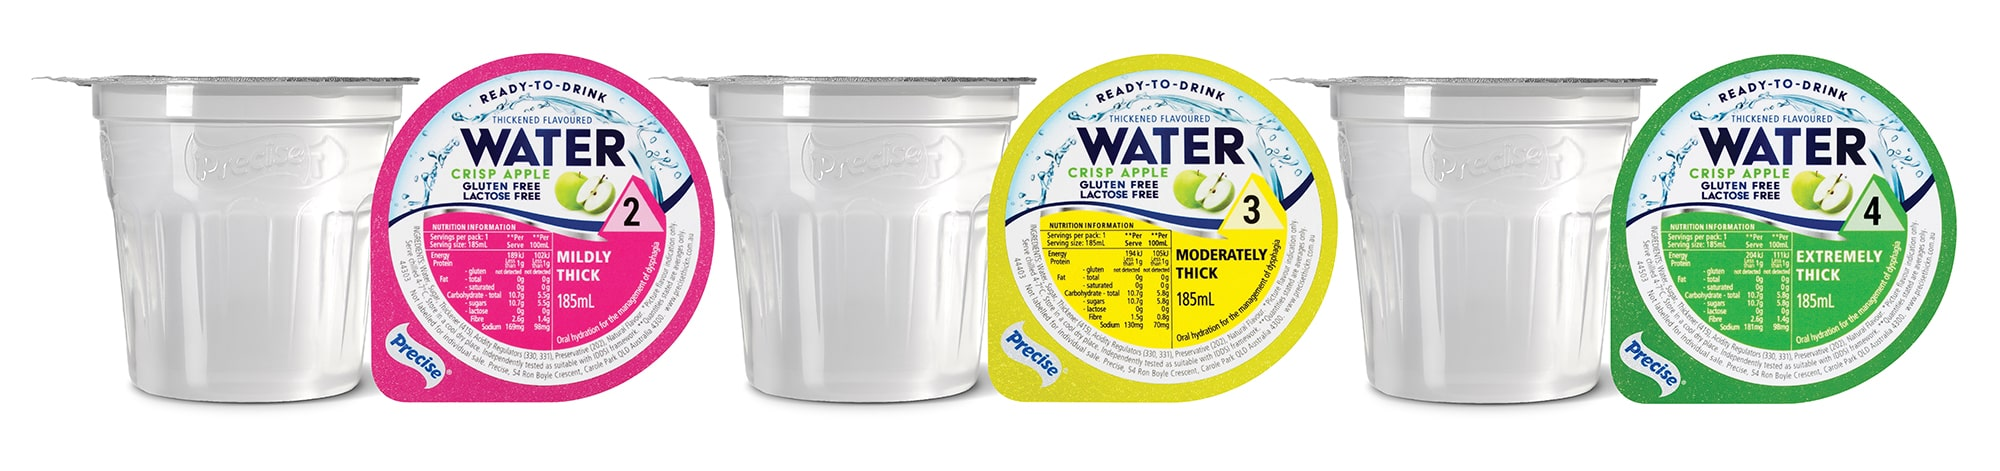 RTD Crisp Apple Water